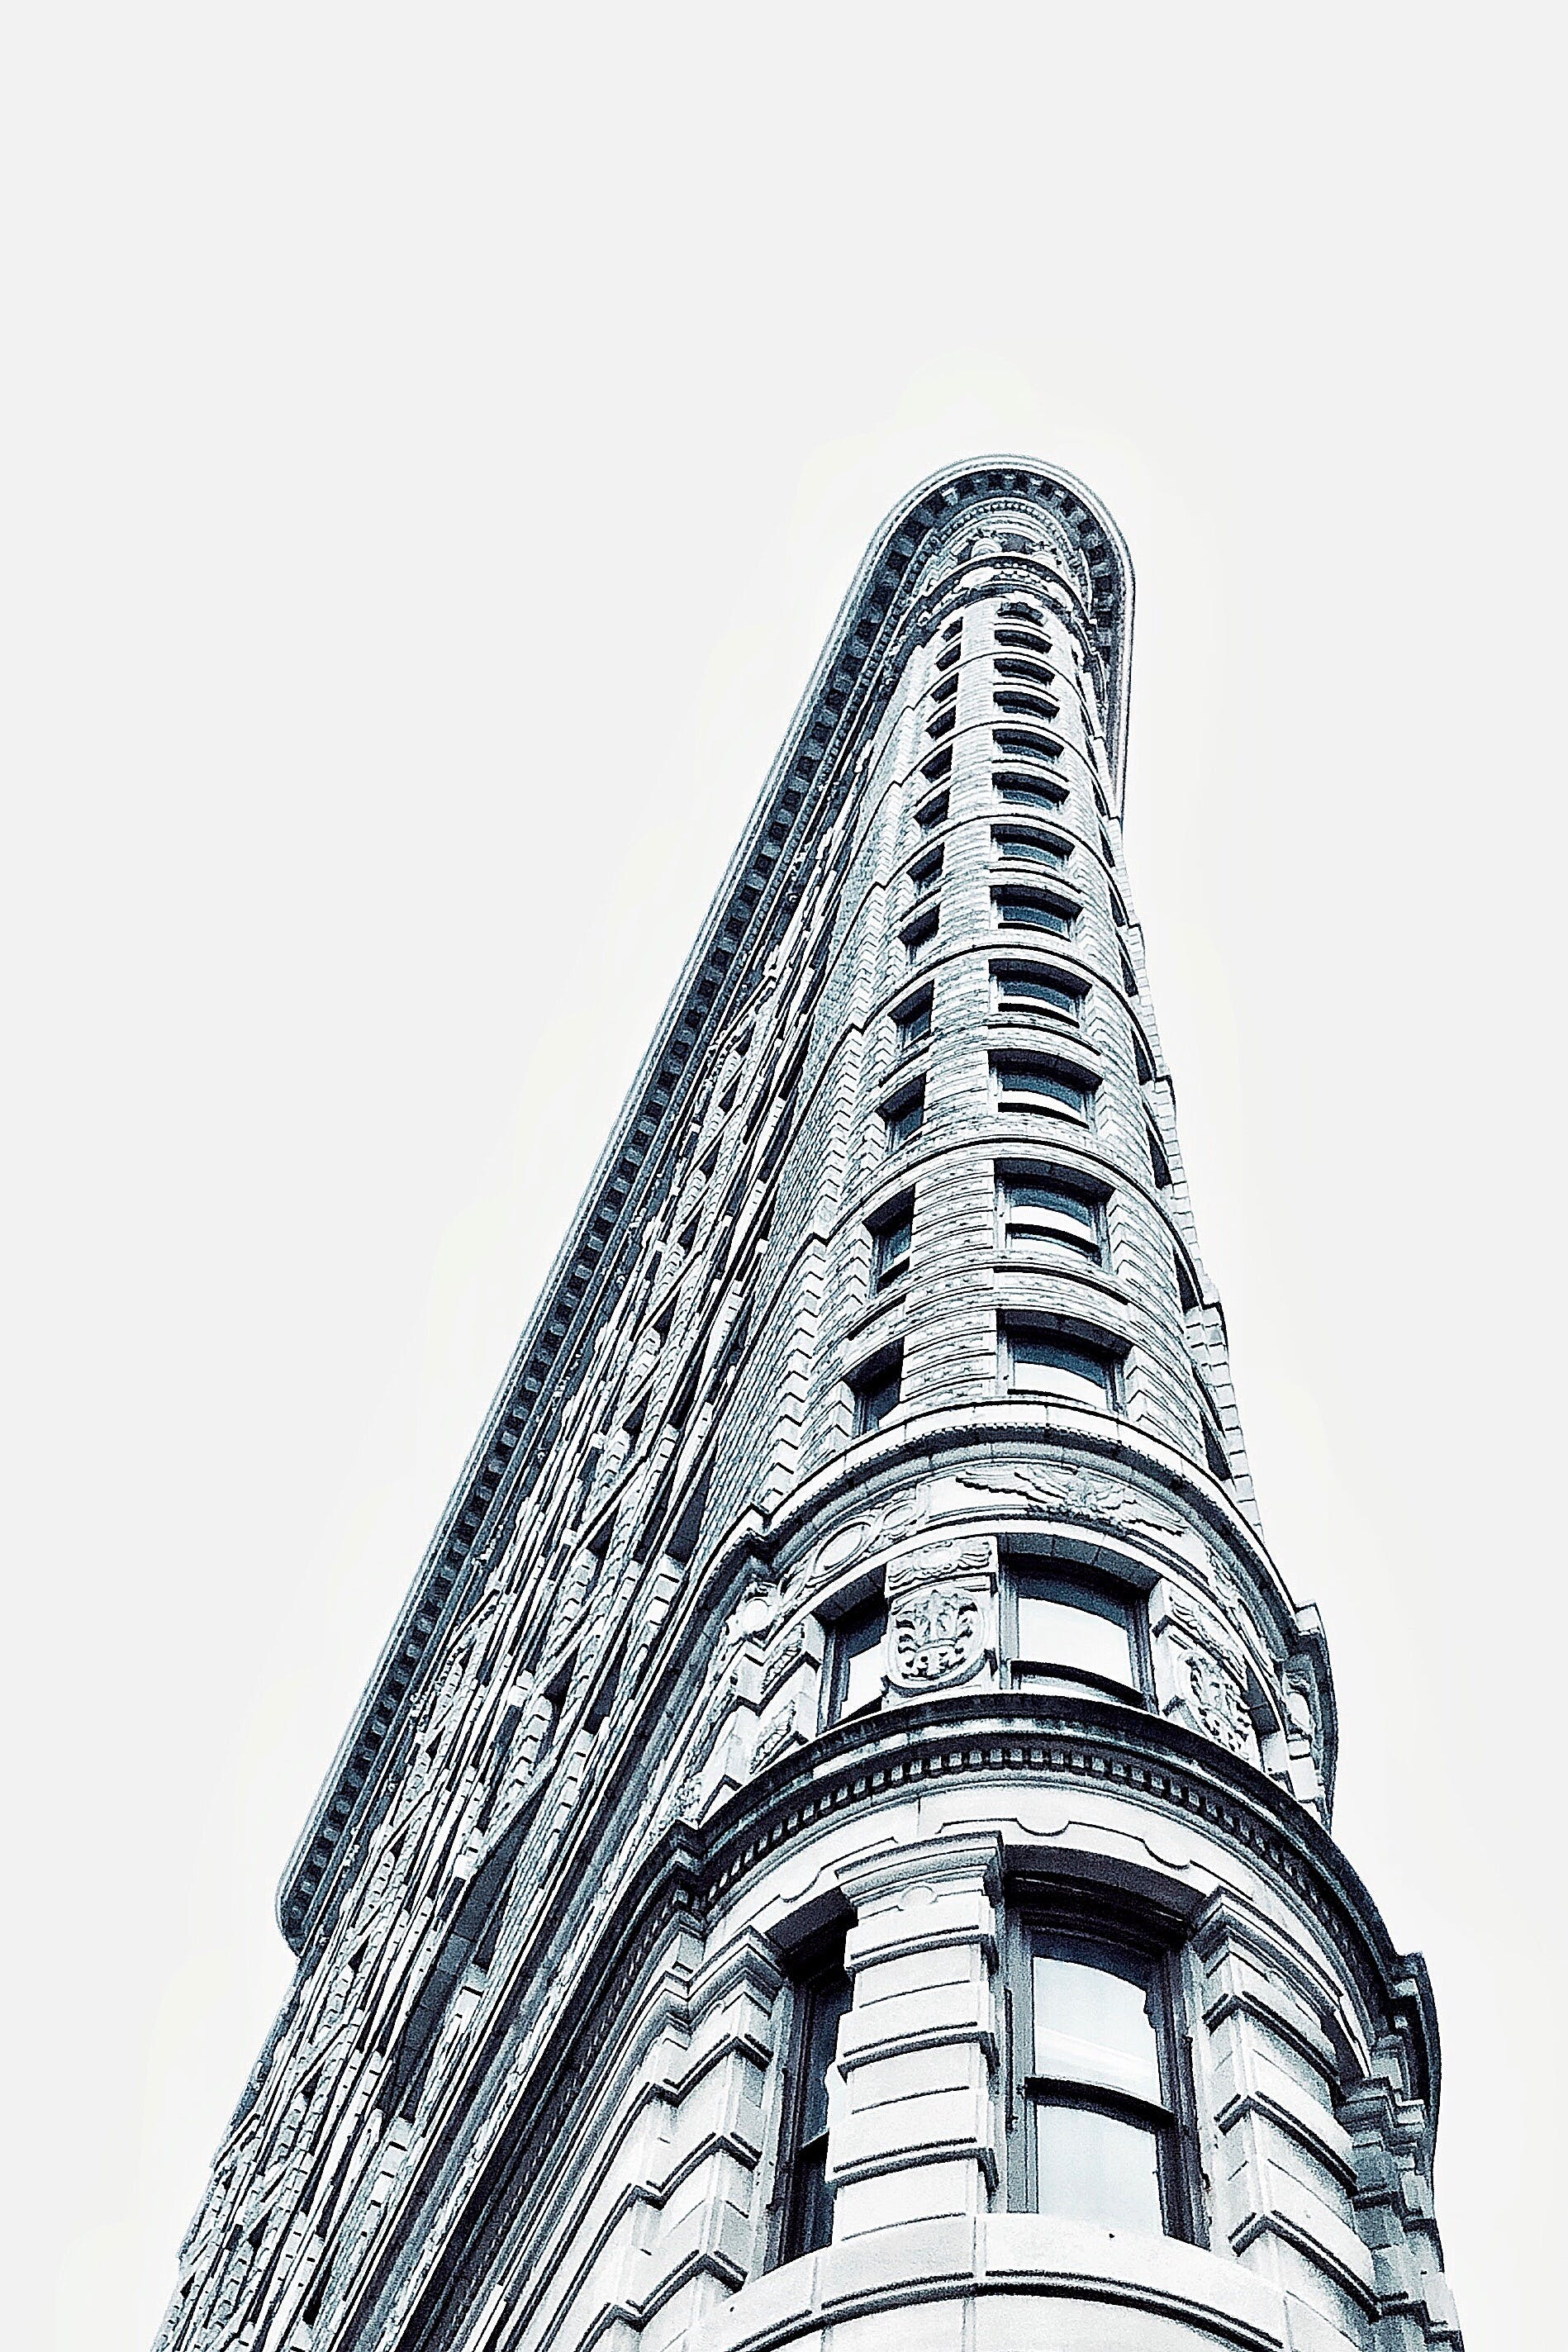 Low-angle Photo of Flatiron Building